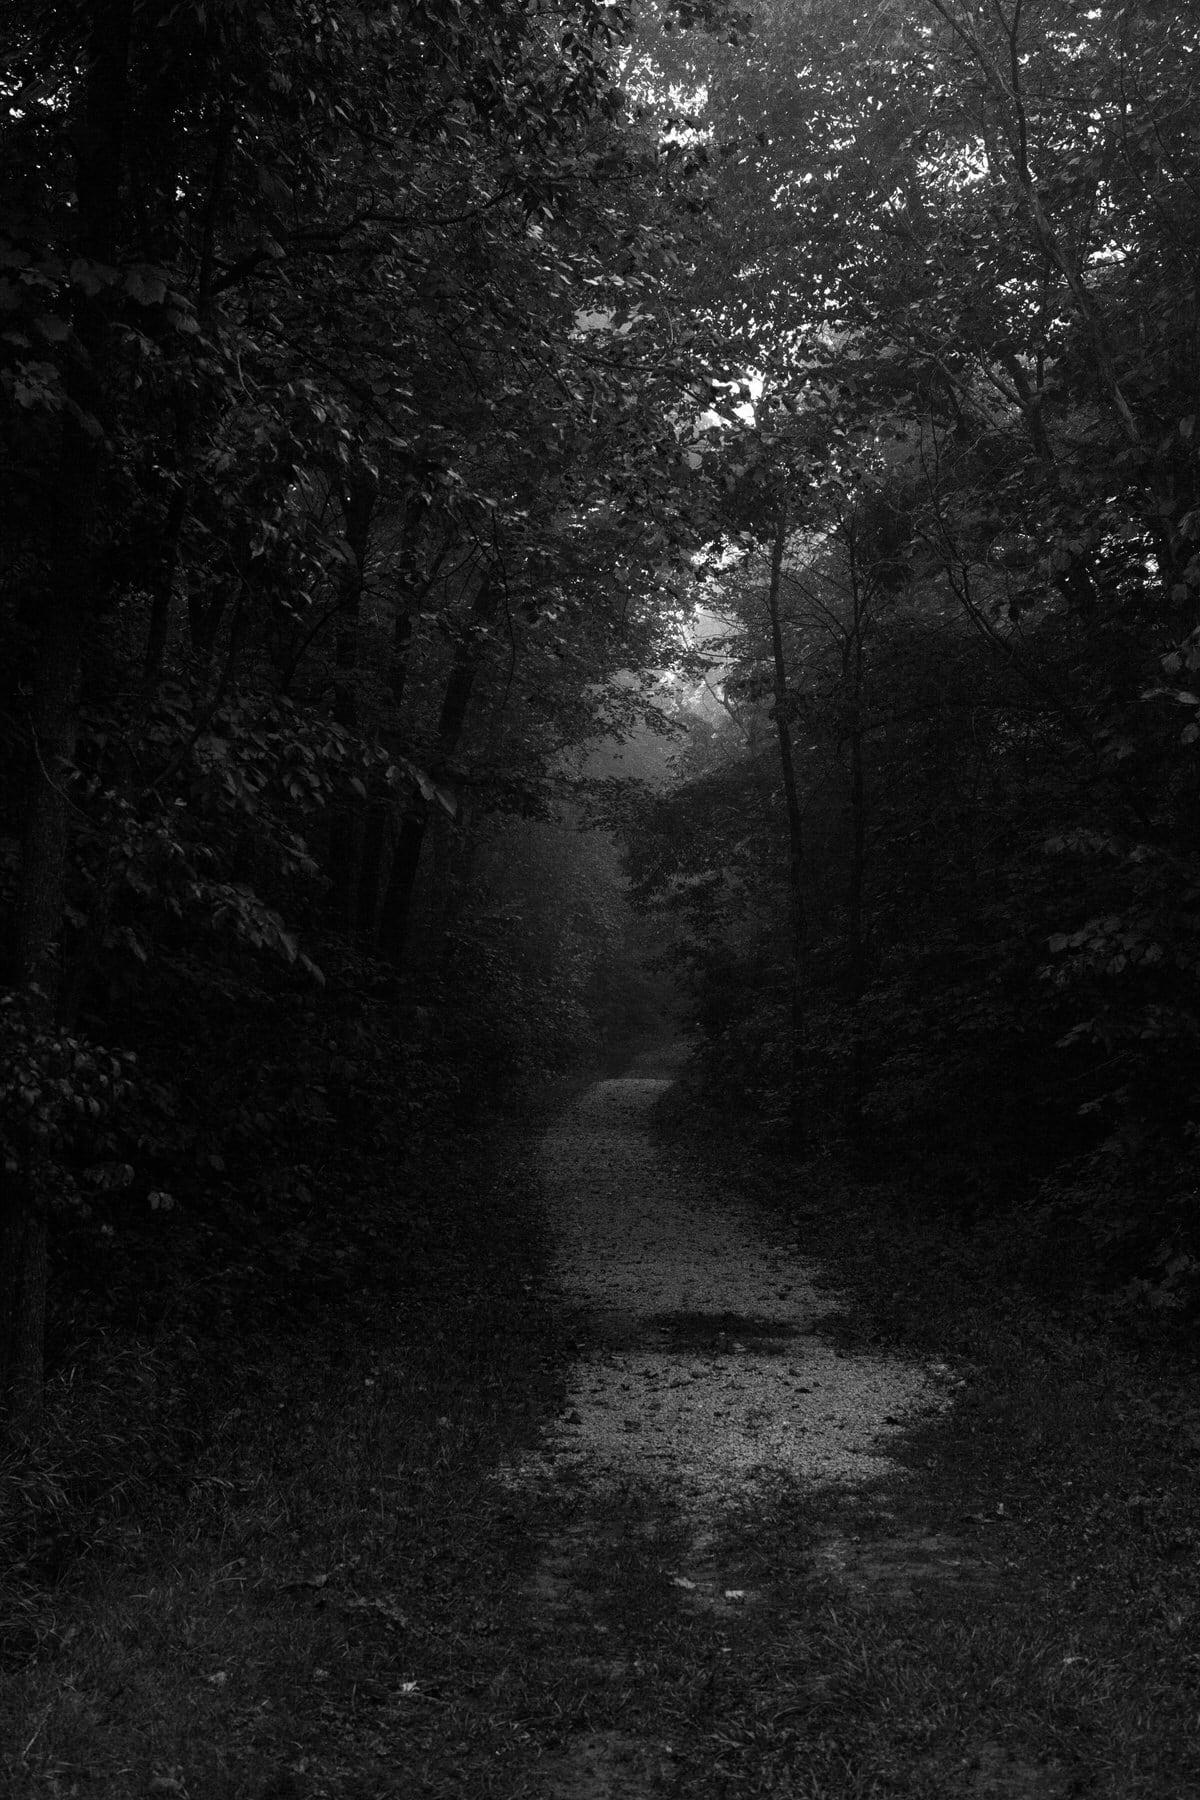 Kiekhaefer-Park-Fond-du-Lac-Wisconsin-black-and-white-fine-art-photography-by-Studio-L-photographer-Laura-Schneider-_3378